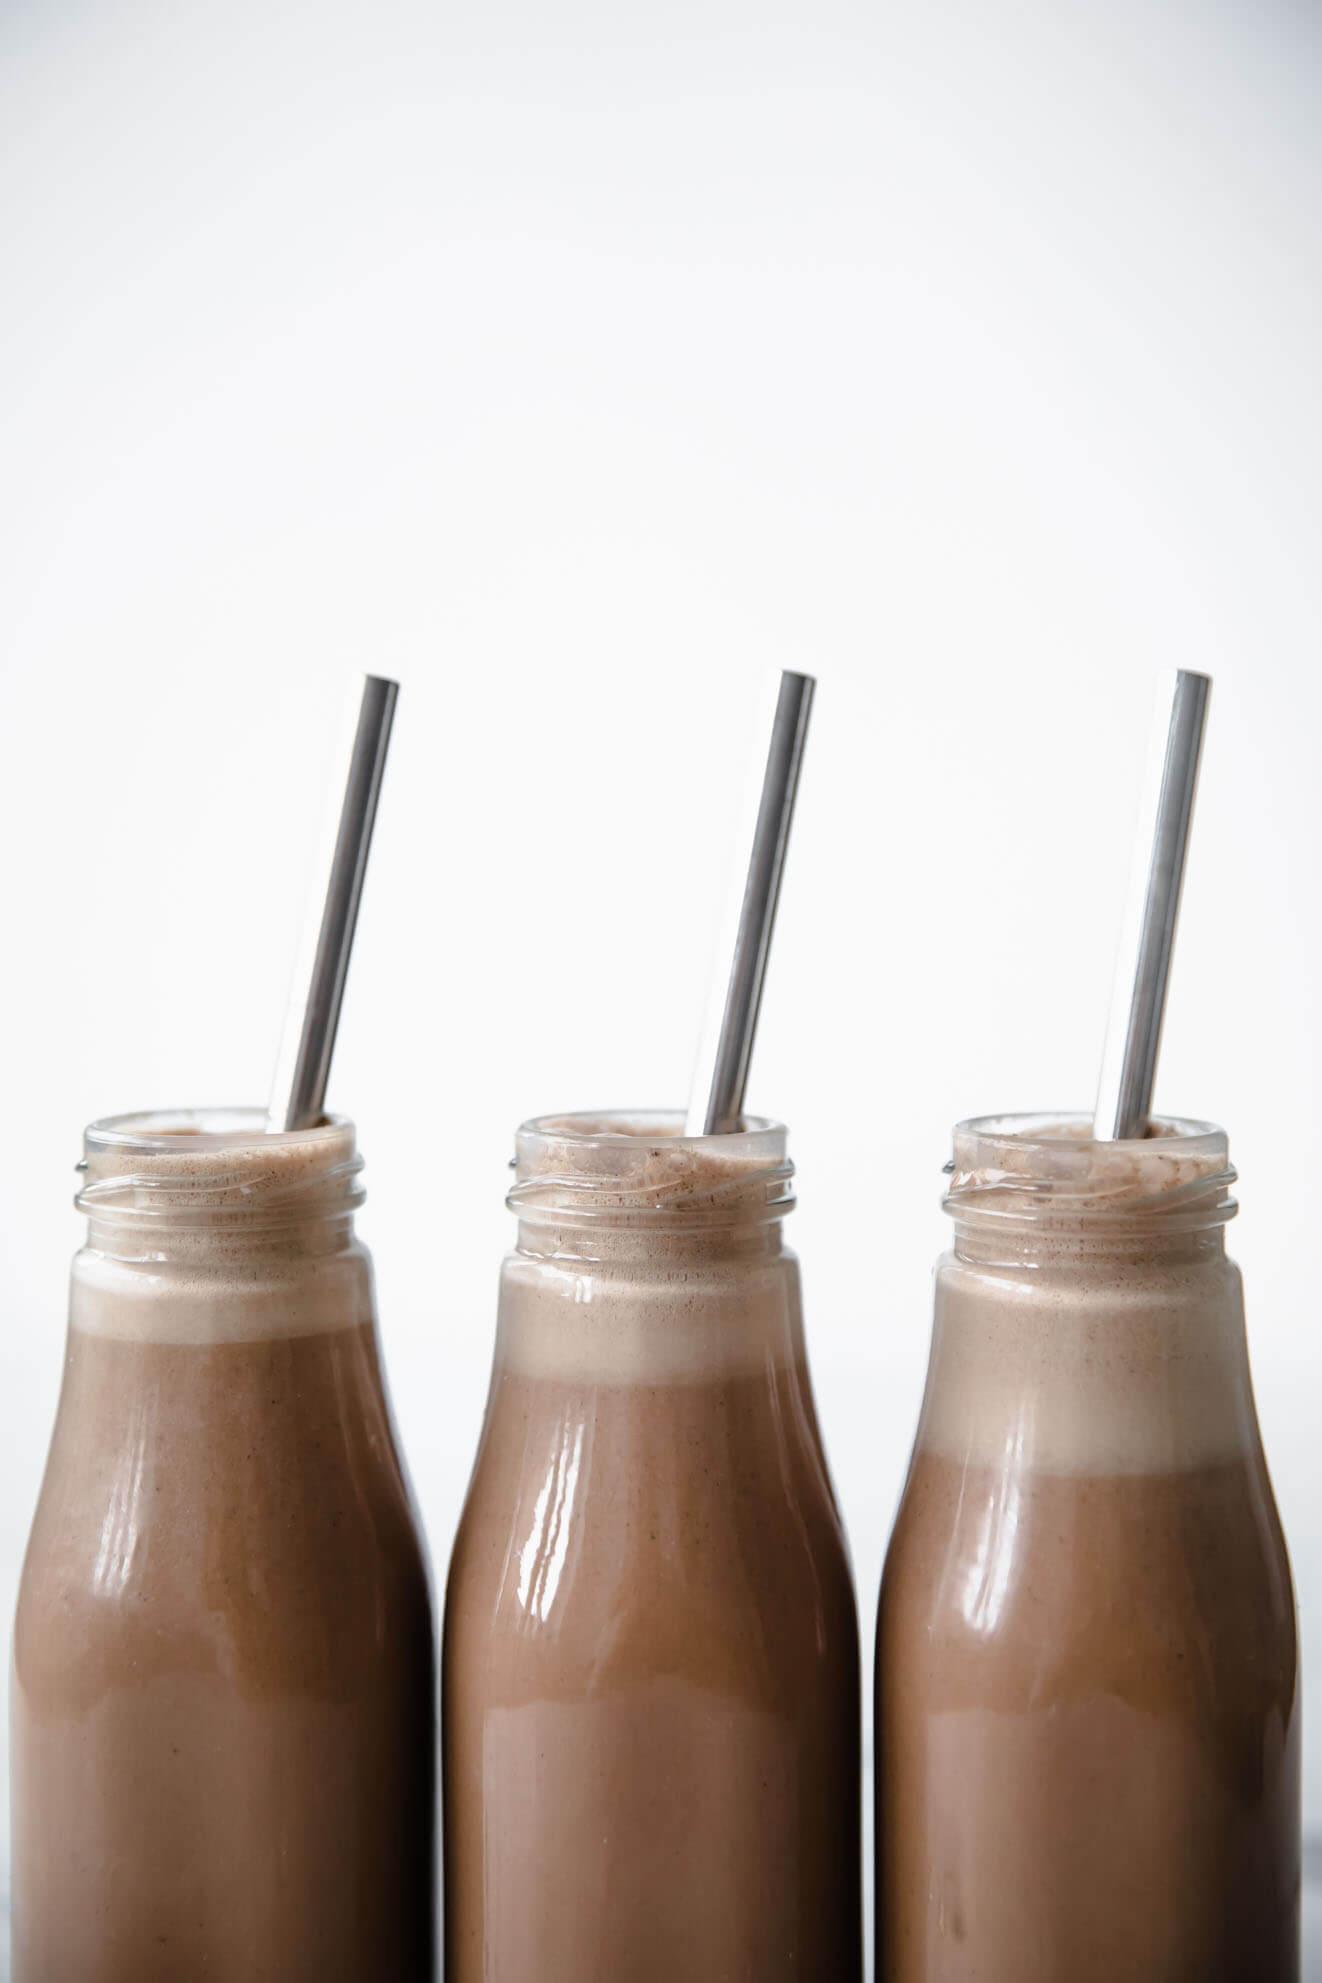 Vegan Chocolate Milk